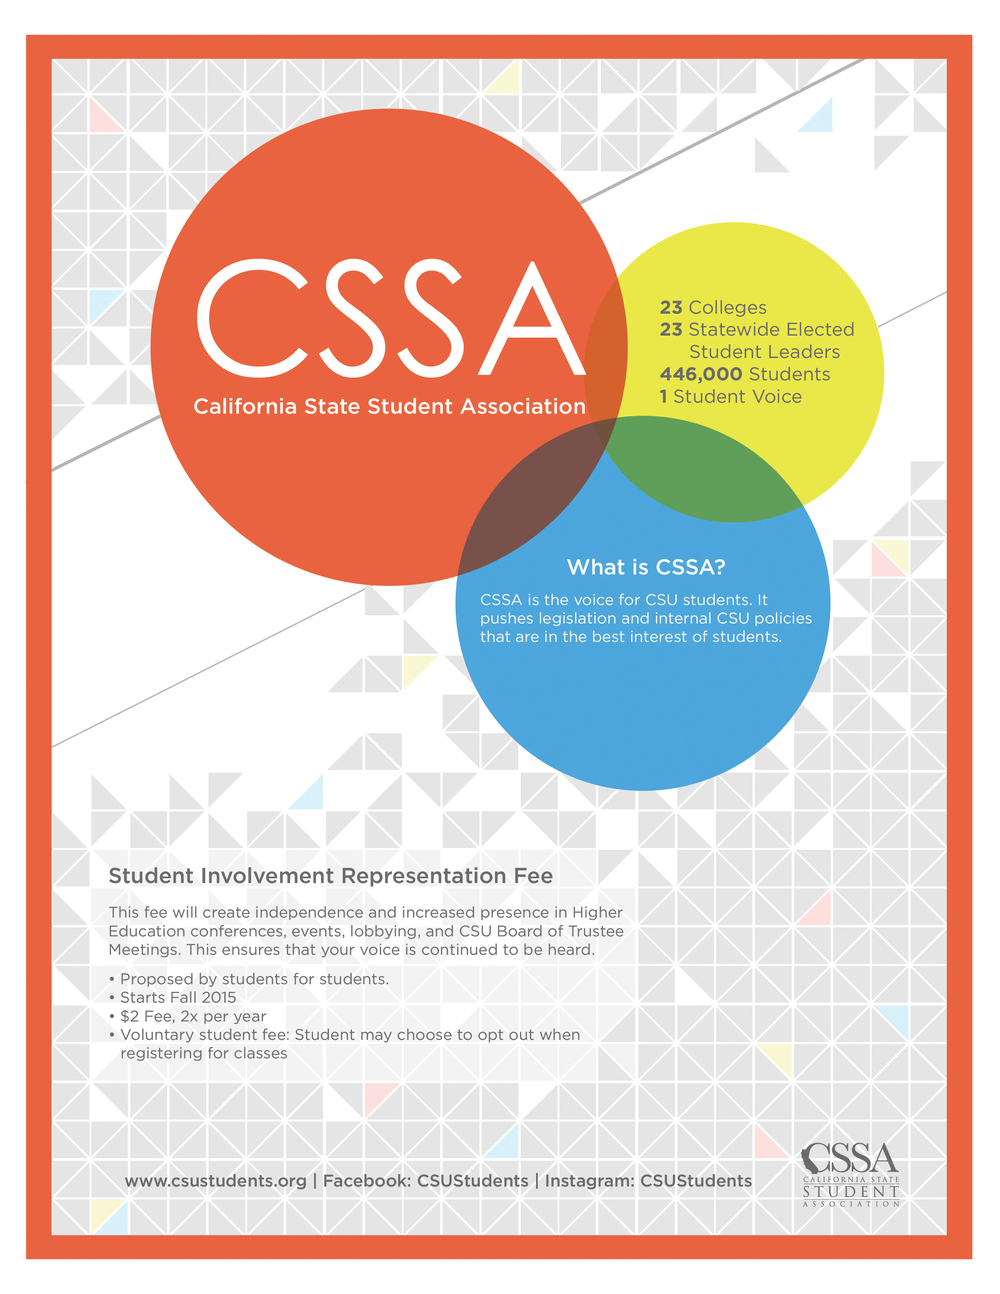 CSSA-01.jpg